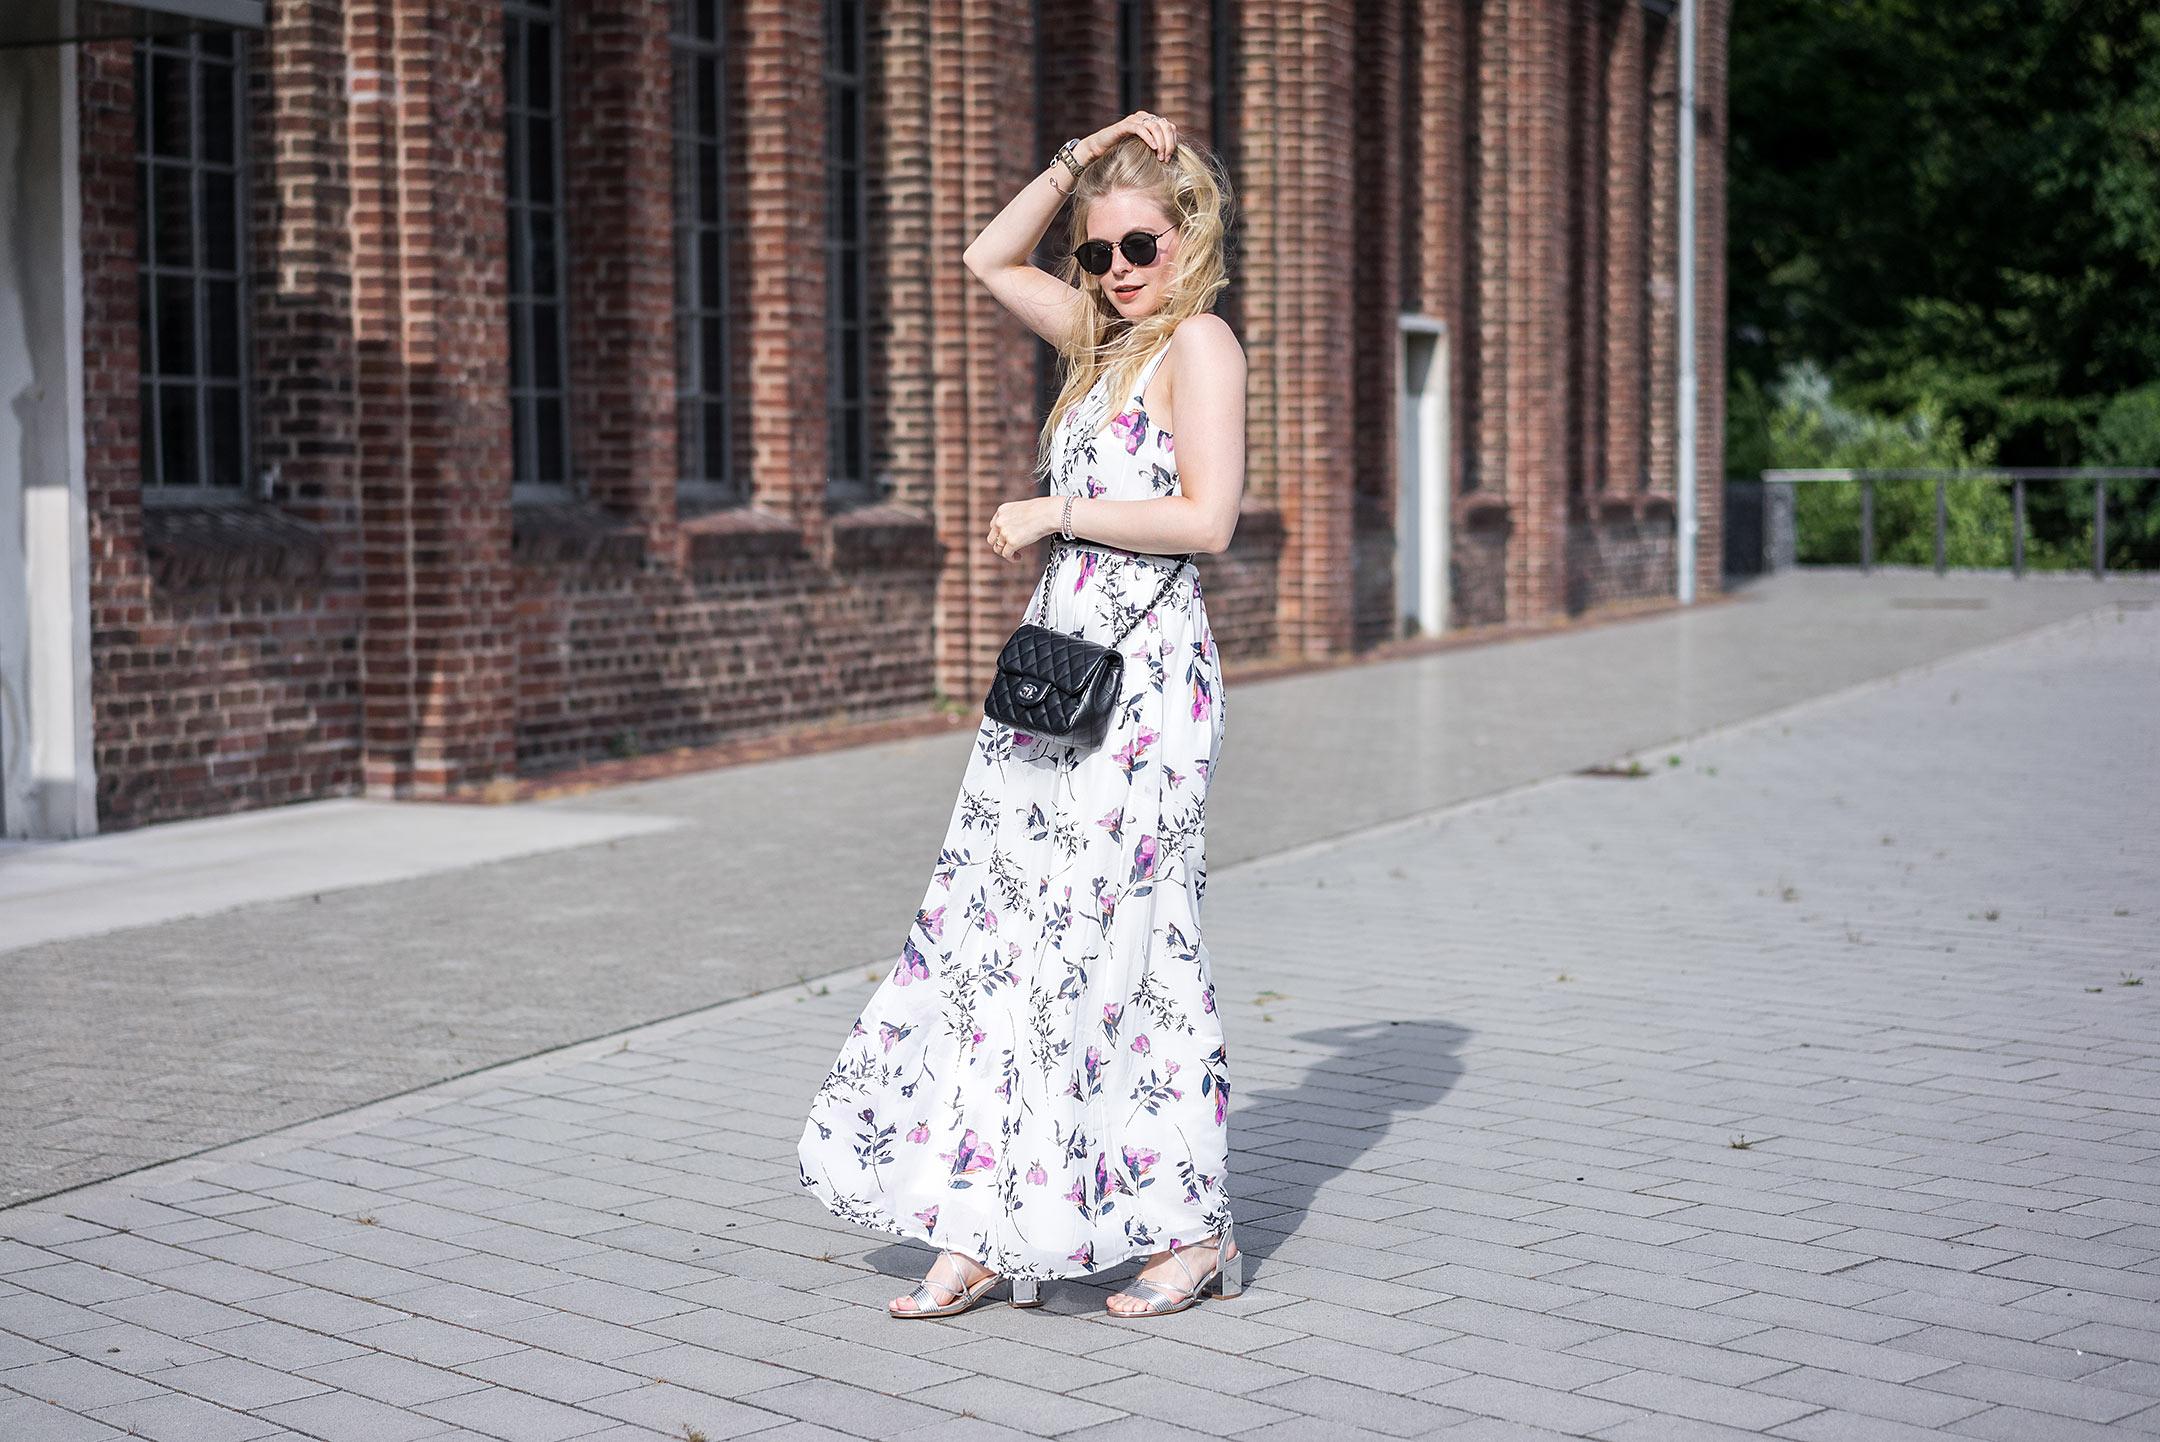 Maxikleid Blumenmuster Flowerprint Outfit Fashion Blog Düsseldorf Sunnyinga